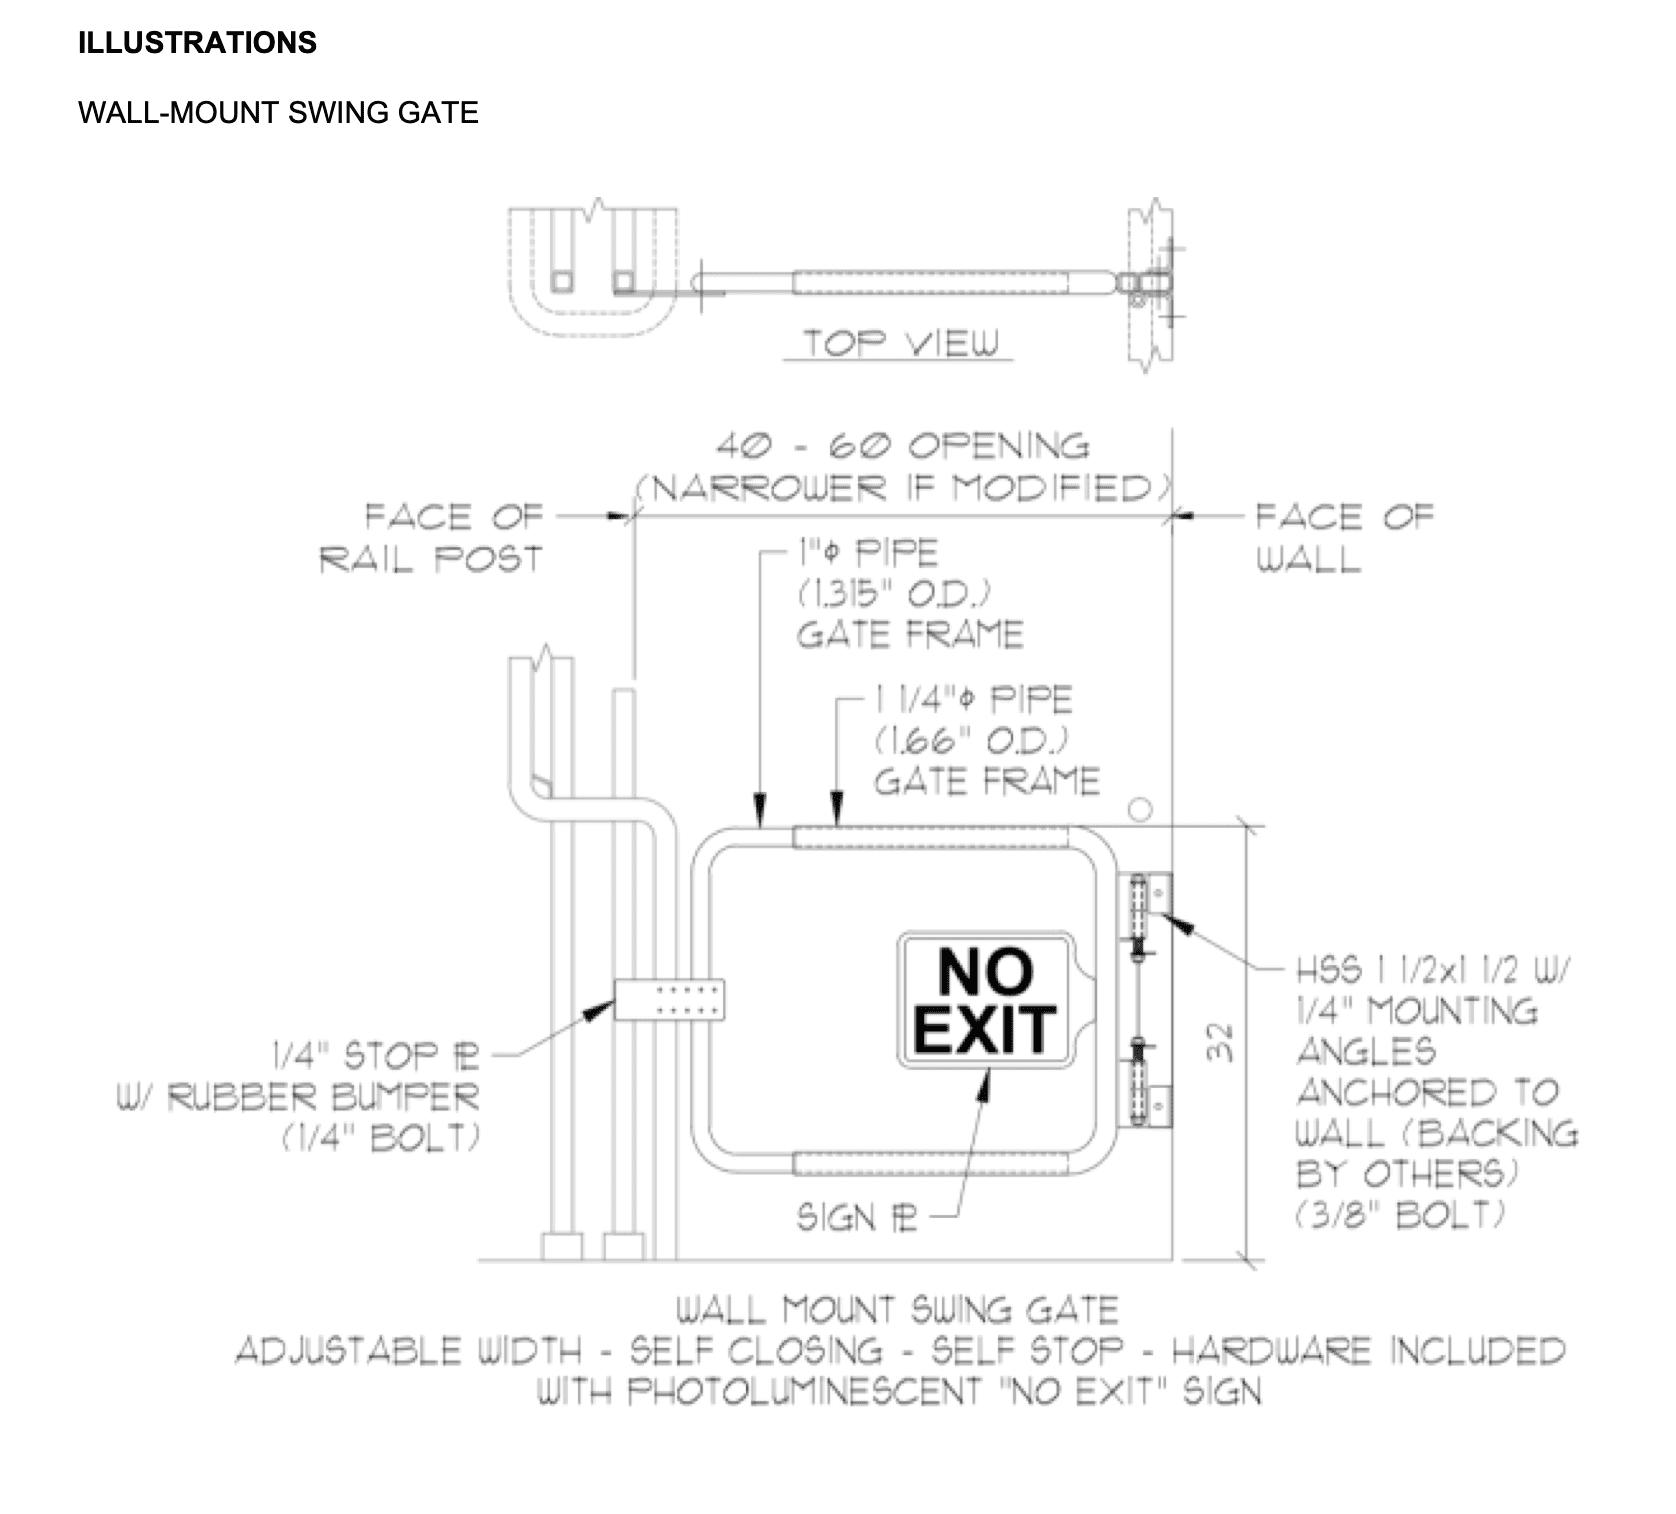 Egress gate illustration